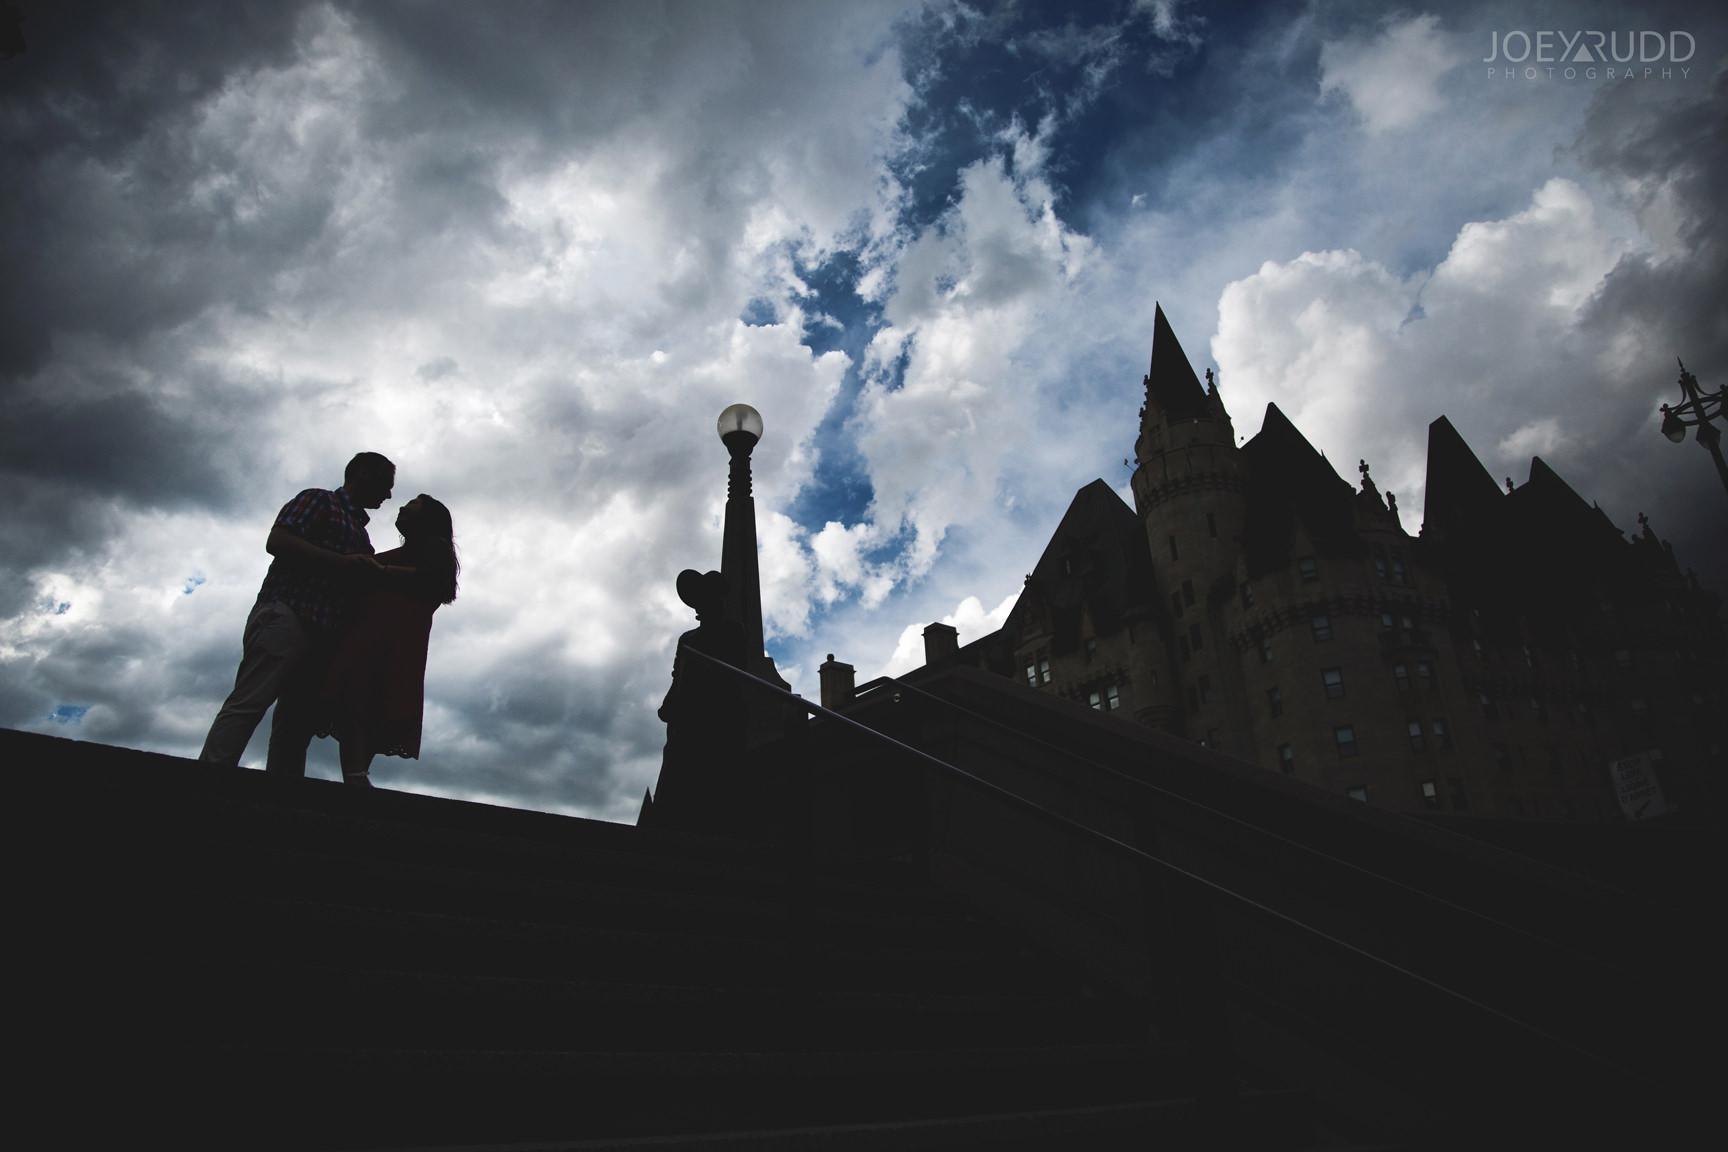 Ottawa Engagement Photography by Ottawa Photographer Joey Rudd Photography Chateau Laurier Downtown